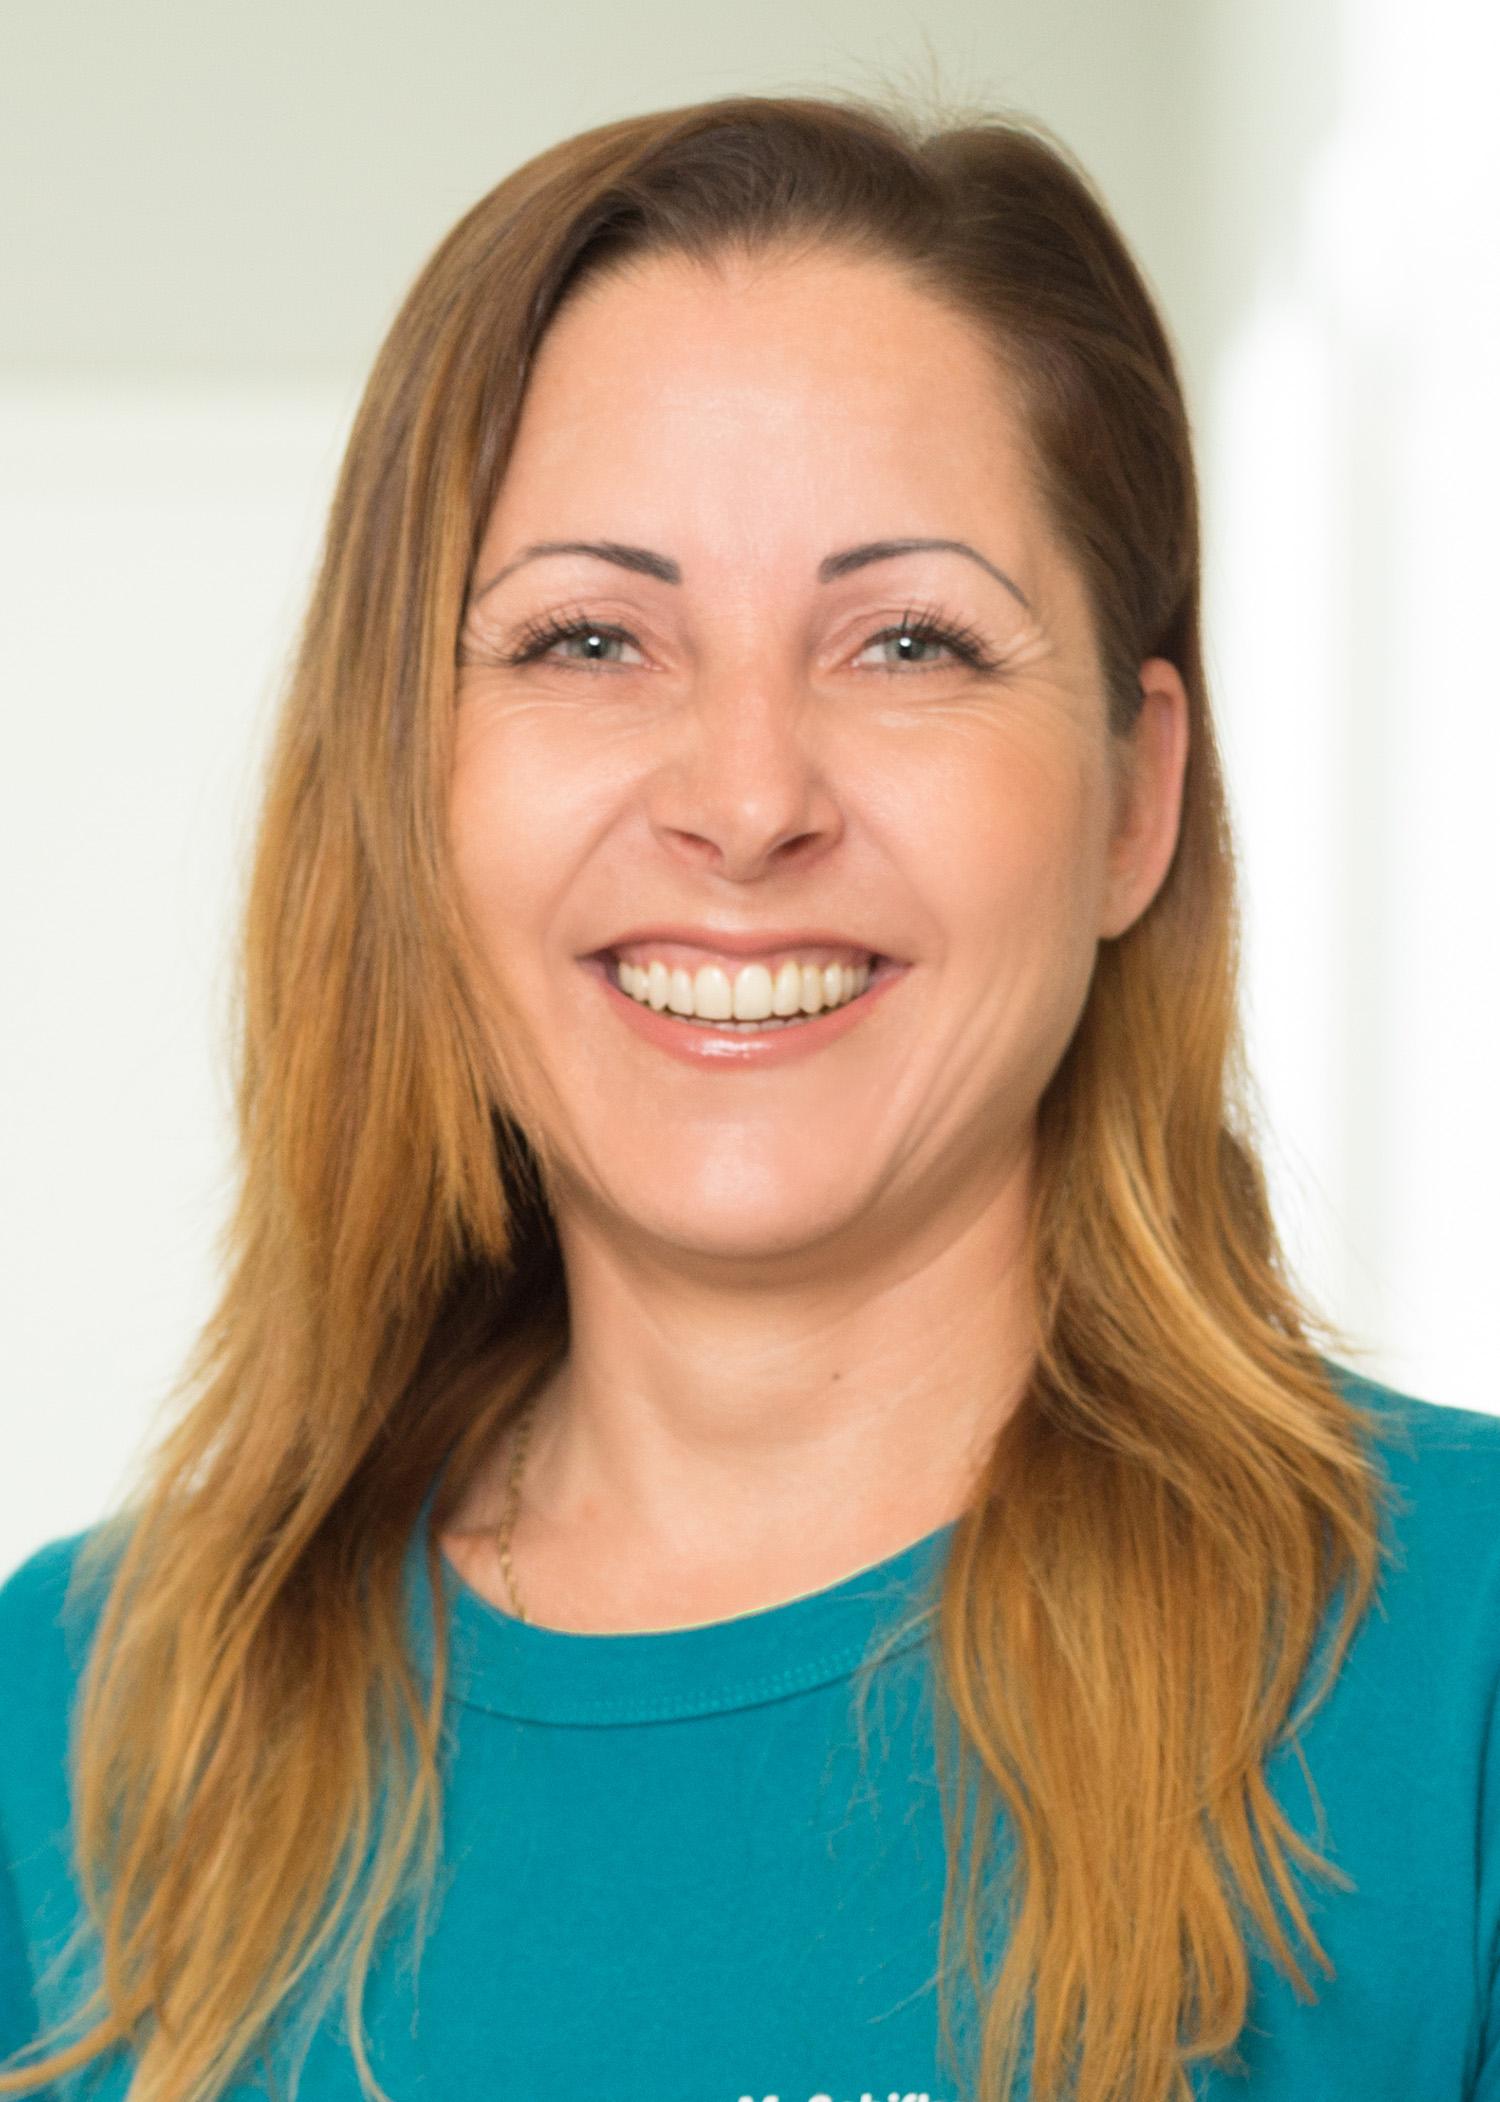 Martina Schifko